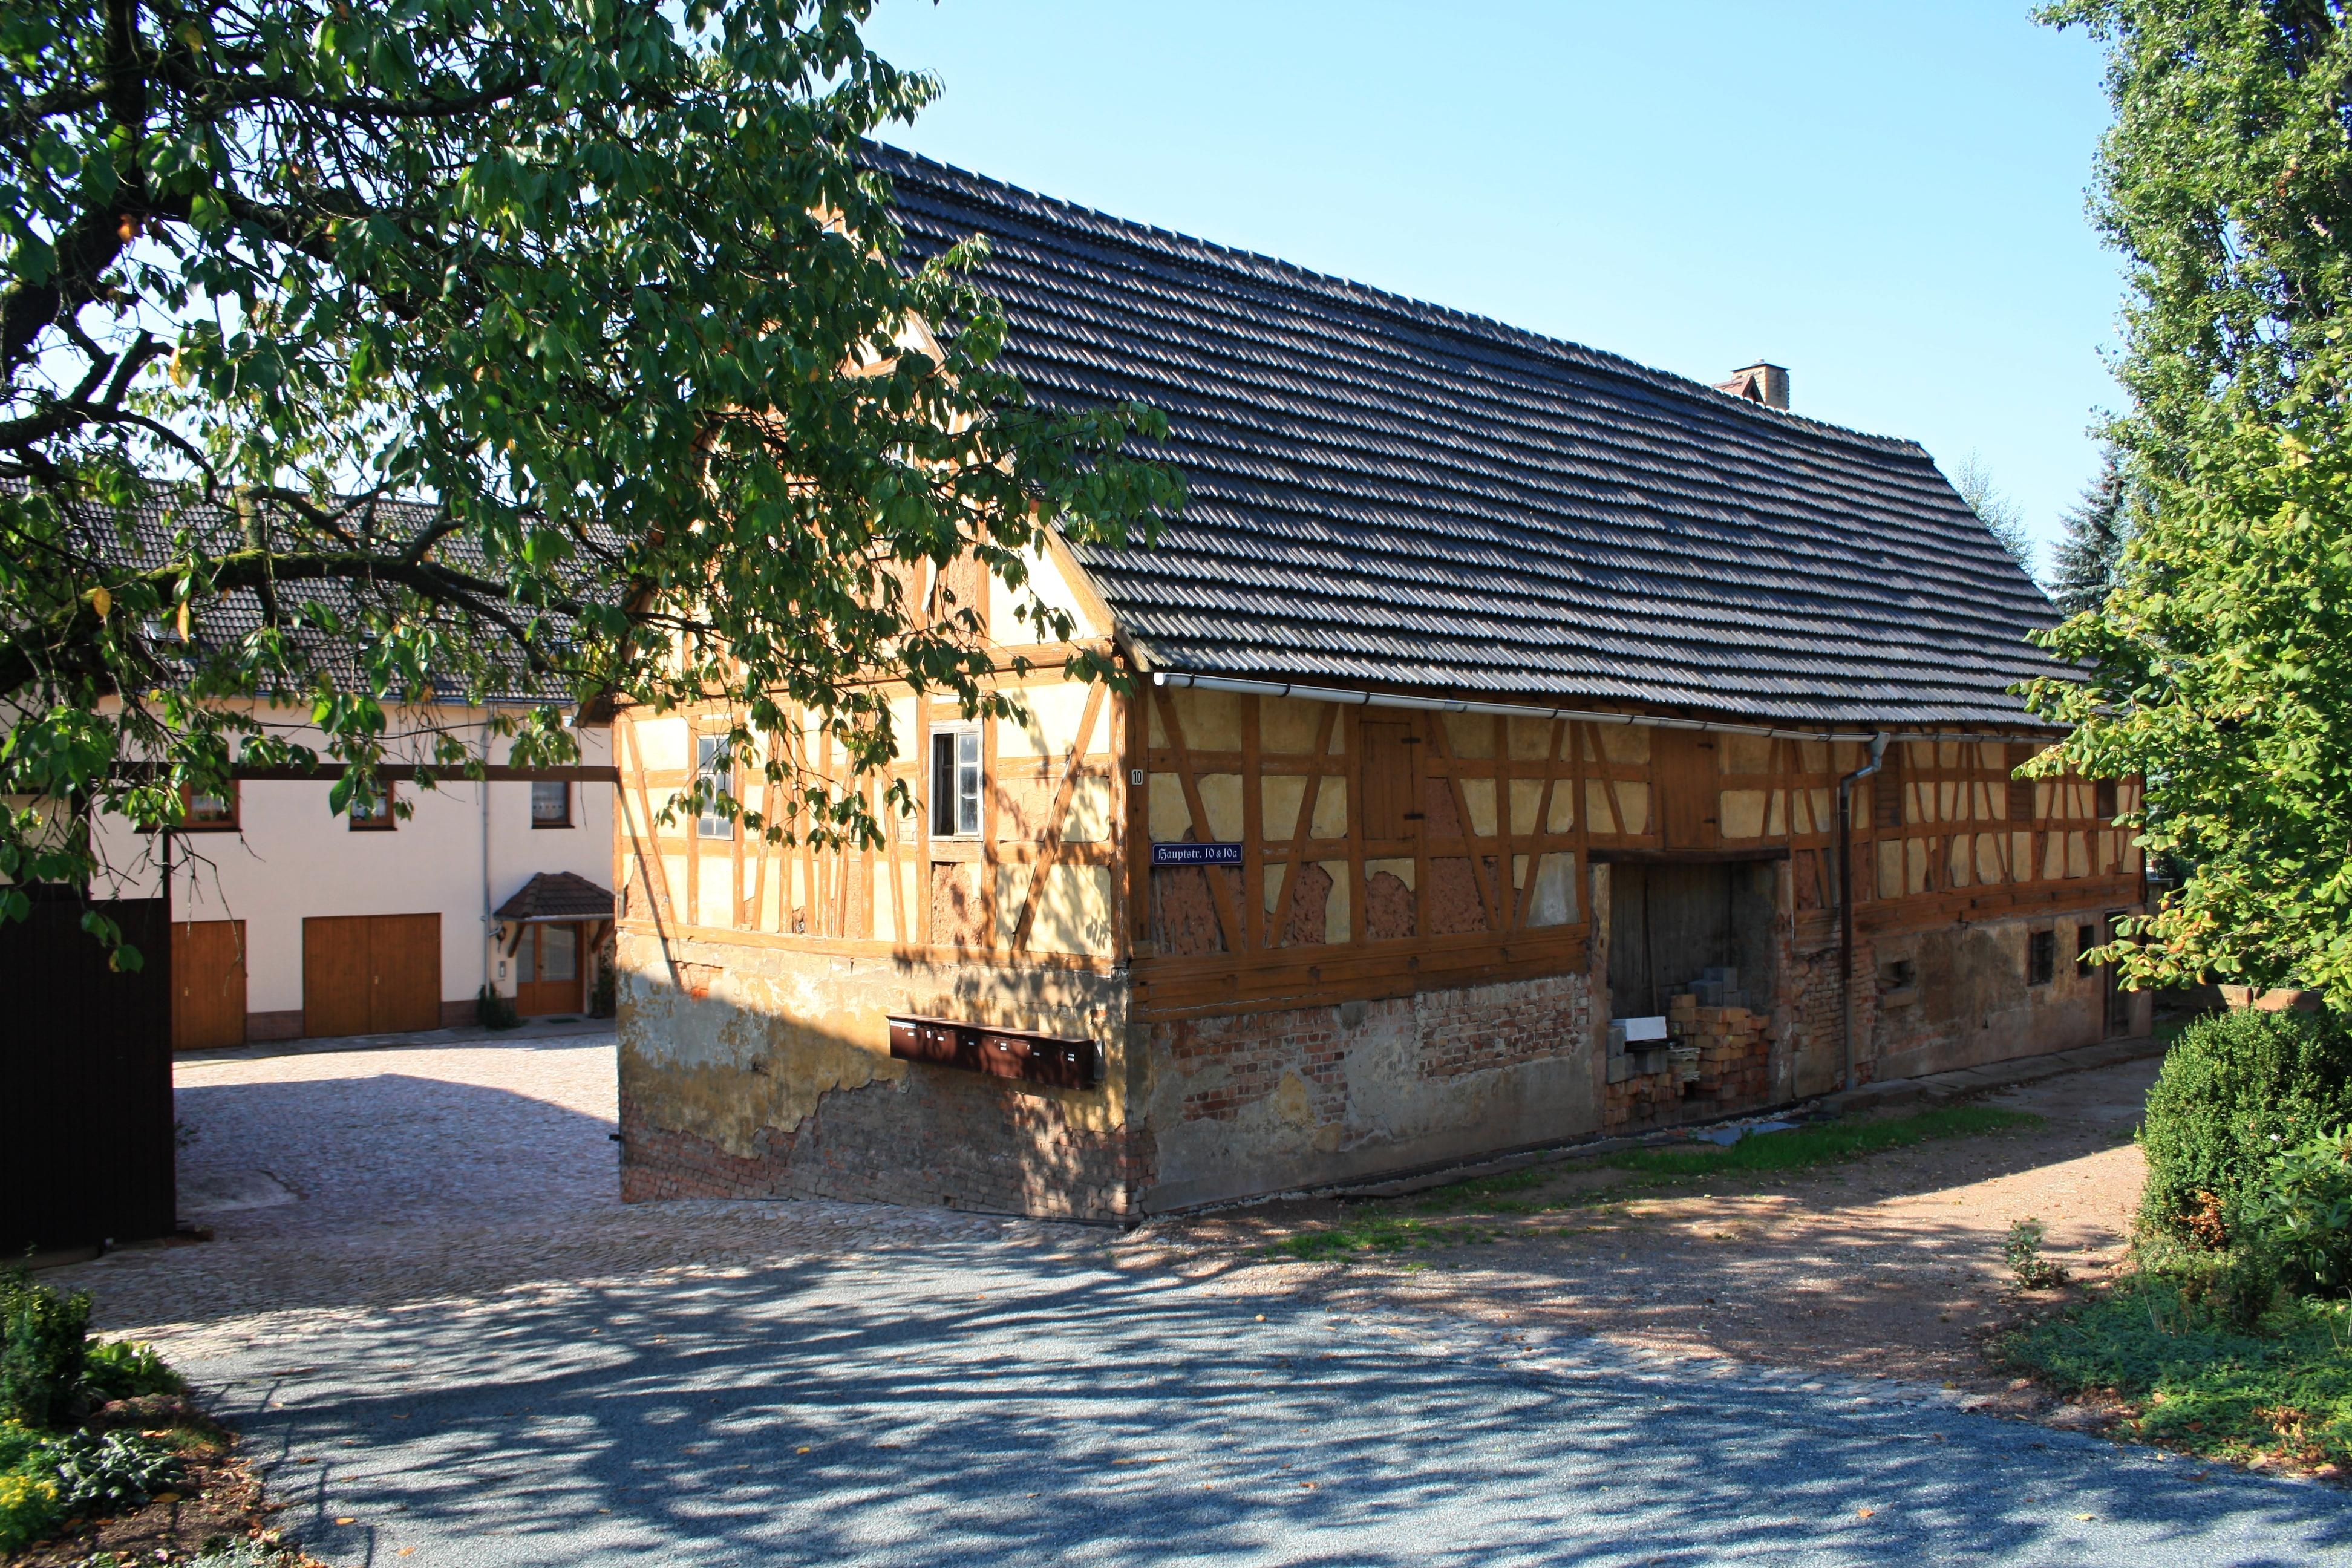 File fachwerk umgebinde oberlaube hohndorf erzgebirge for Fachwerk wiki